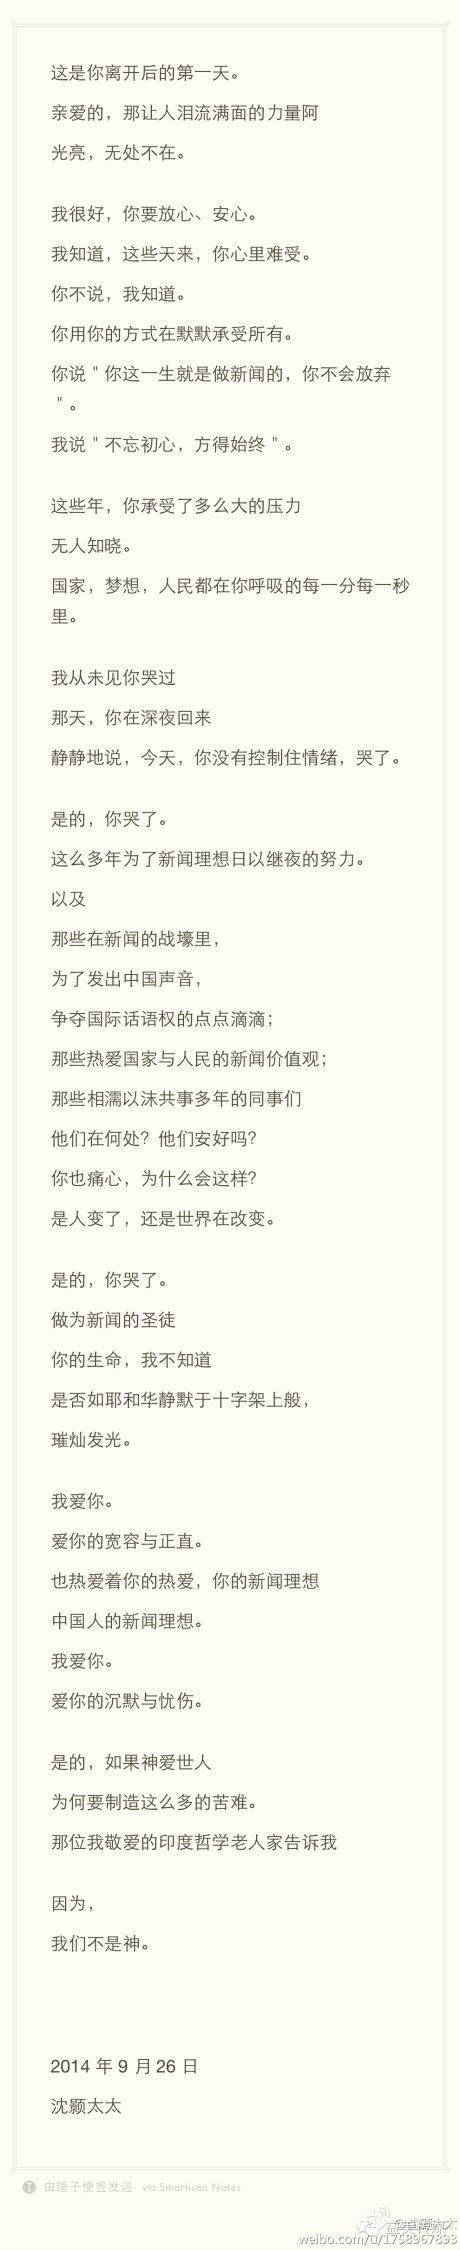 Minitrue: Poem to Shen Hao